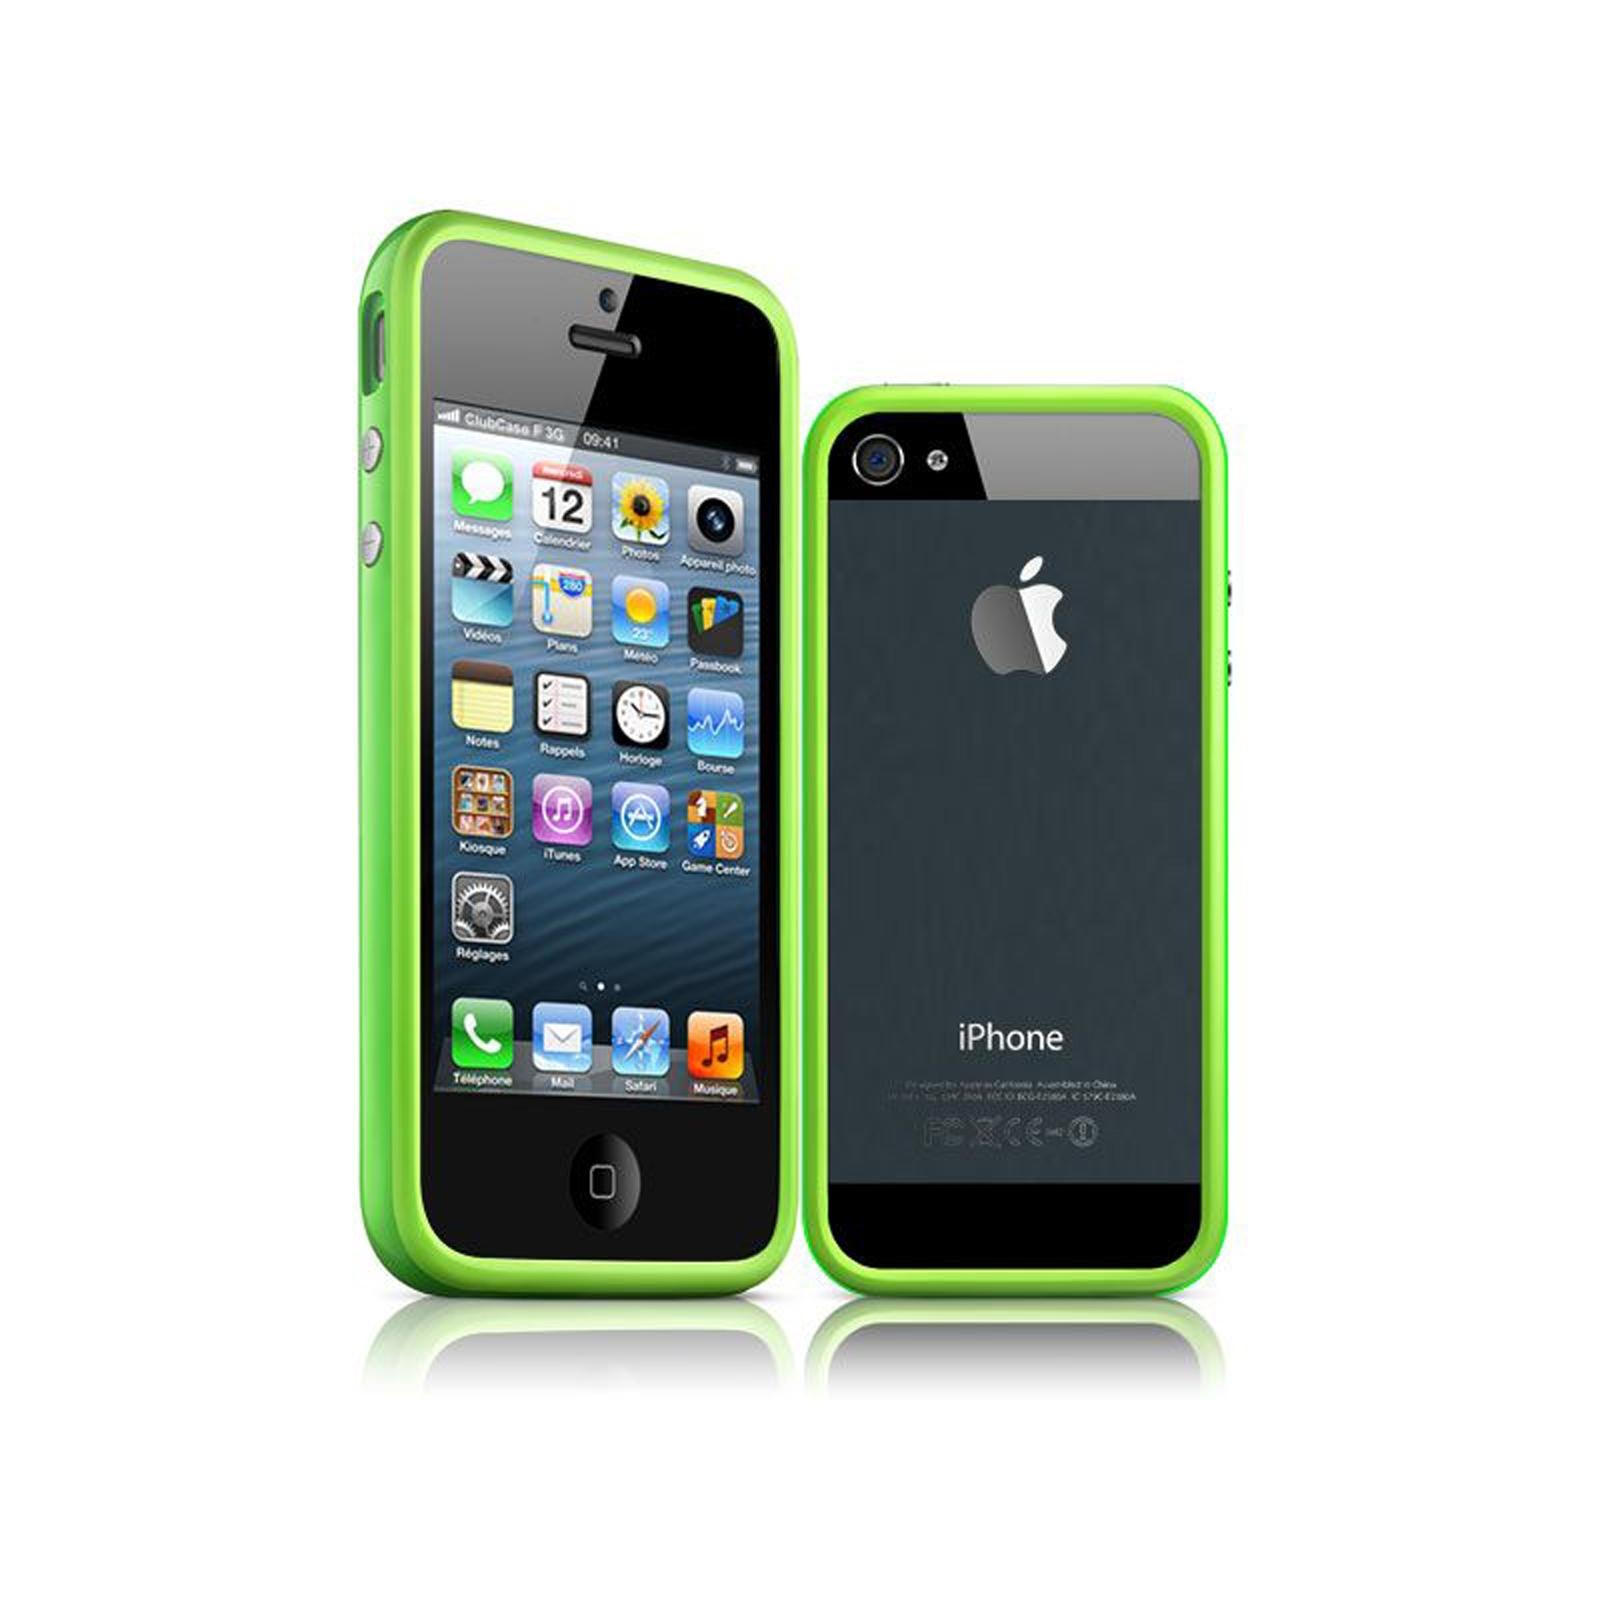 coque bumper iphone 5s 5 hq vert. Black Bedroom Furniture Sets. Home Design Ideas